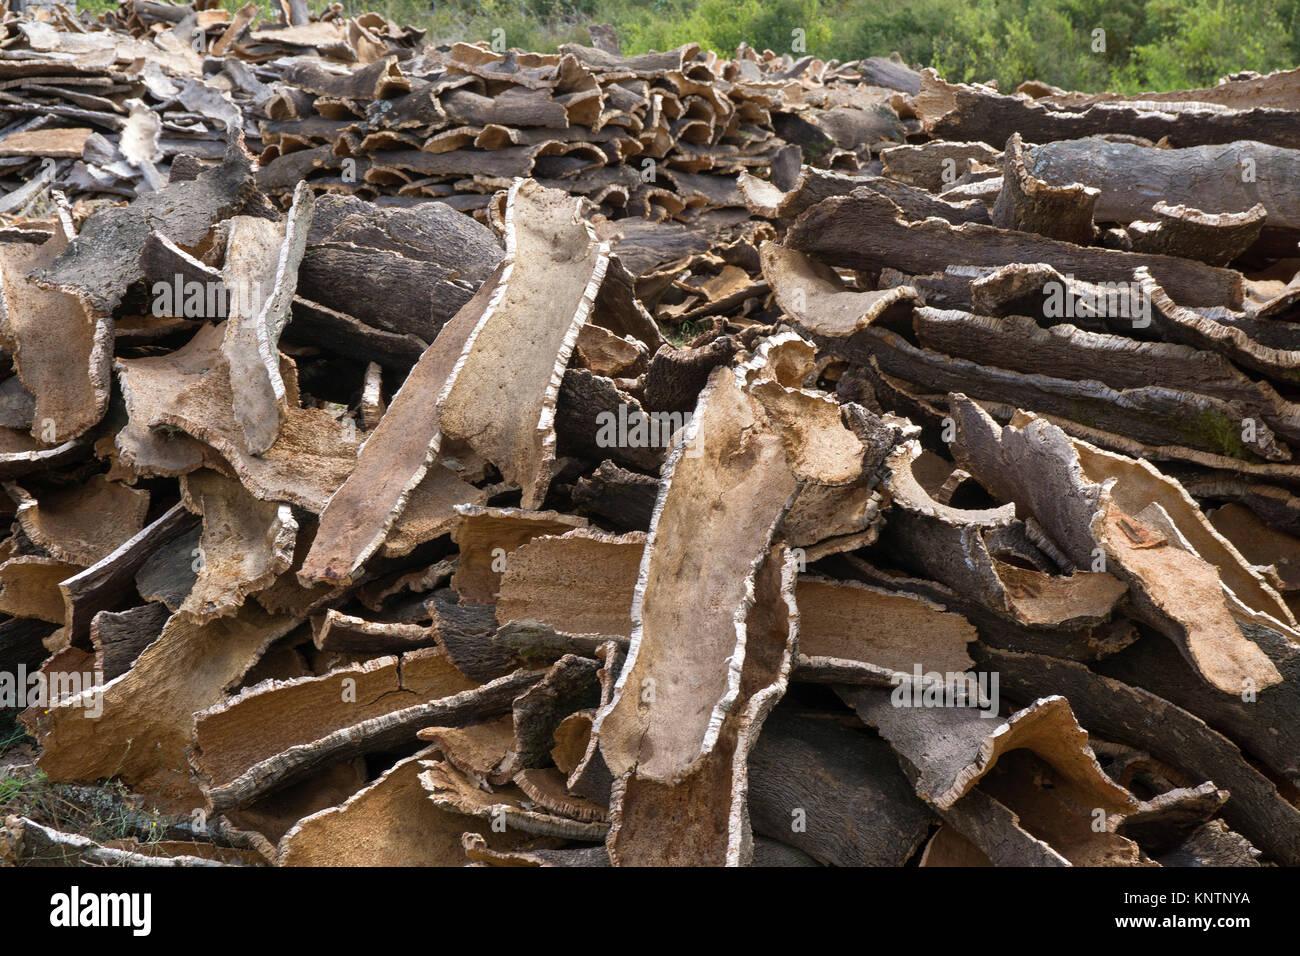 Stacked crust of cork oak (Quercus suber), Olbia-Tempio, Gallura, Sardinia, Italy, Mediterranean sea, Europe - Stock Image